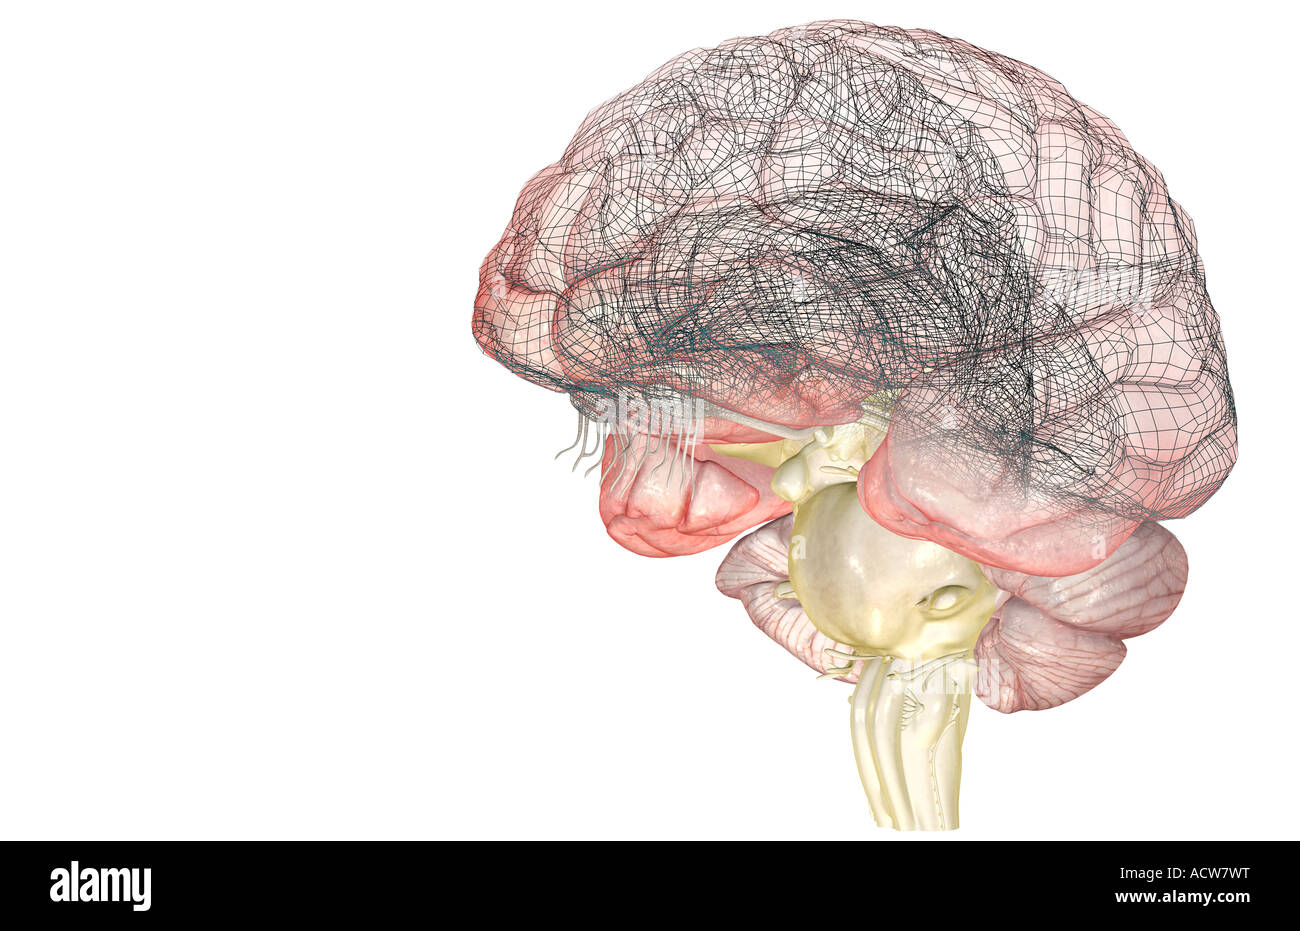 Vagus Nerve Stockfotos & Vagus Nerve Bilder - Alamy